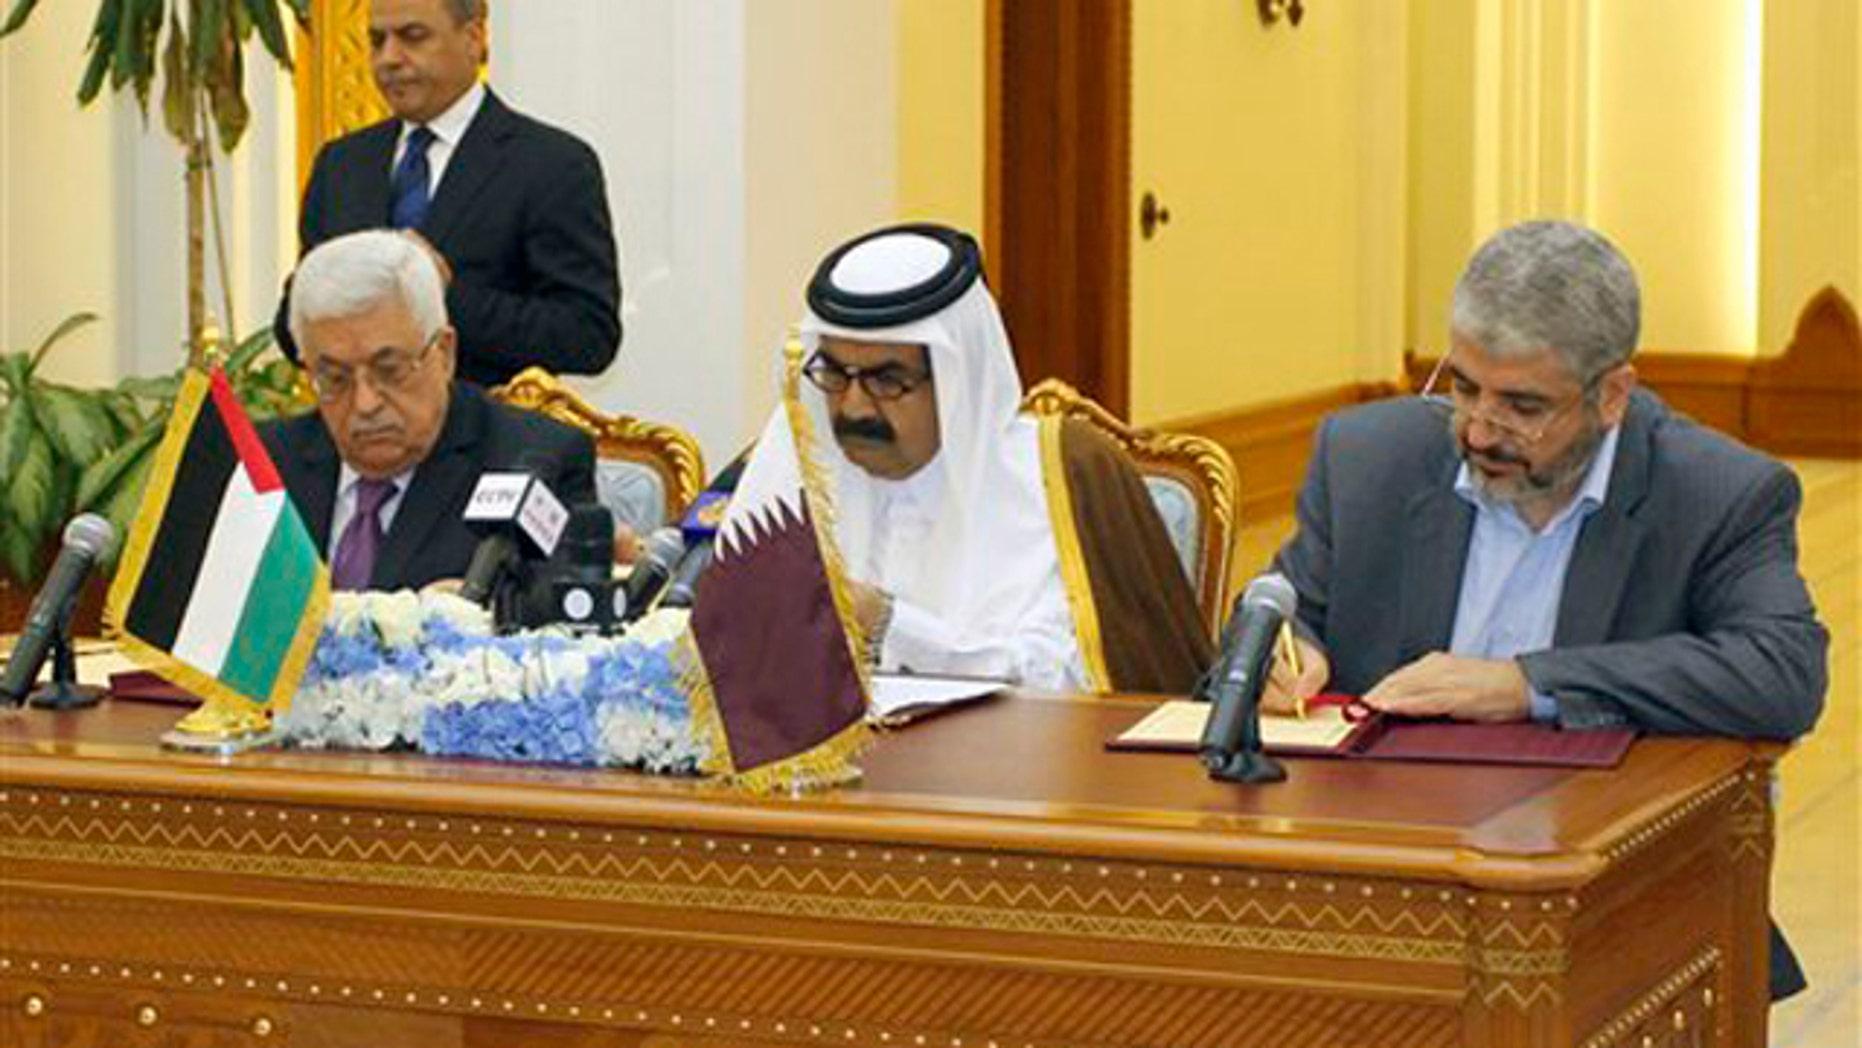 Feb. 6, 2012: Palestinian President Mahmoud Abbas, left, Emir of Qatar Sheikh Hamad bin Khalifa Al Thani, center, and Hamas leader Khaled Mashaal, right, sign an agreement in Doha, Qatar.